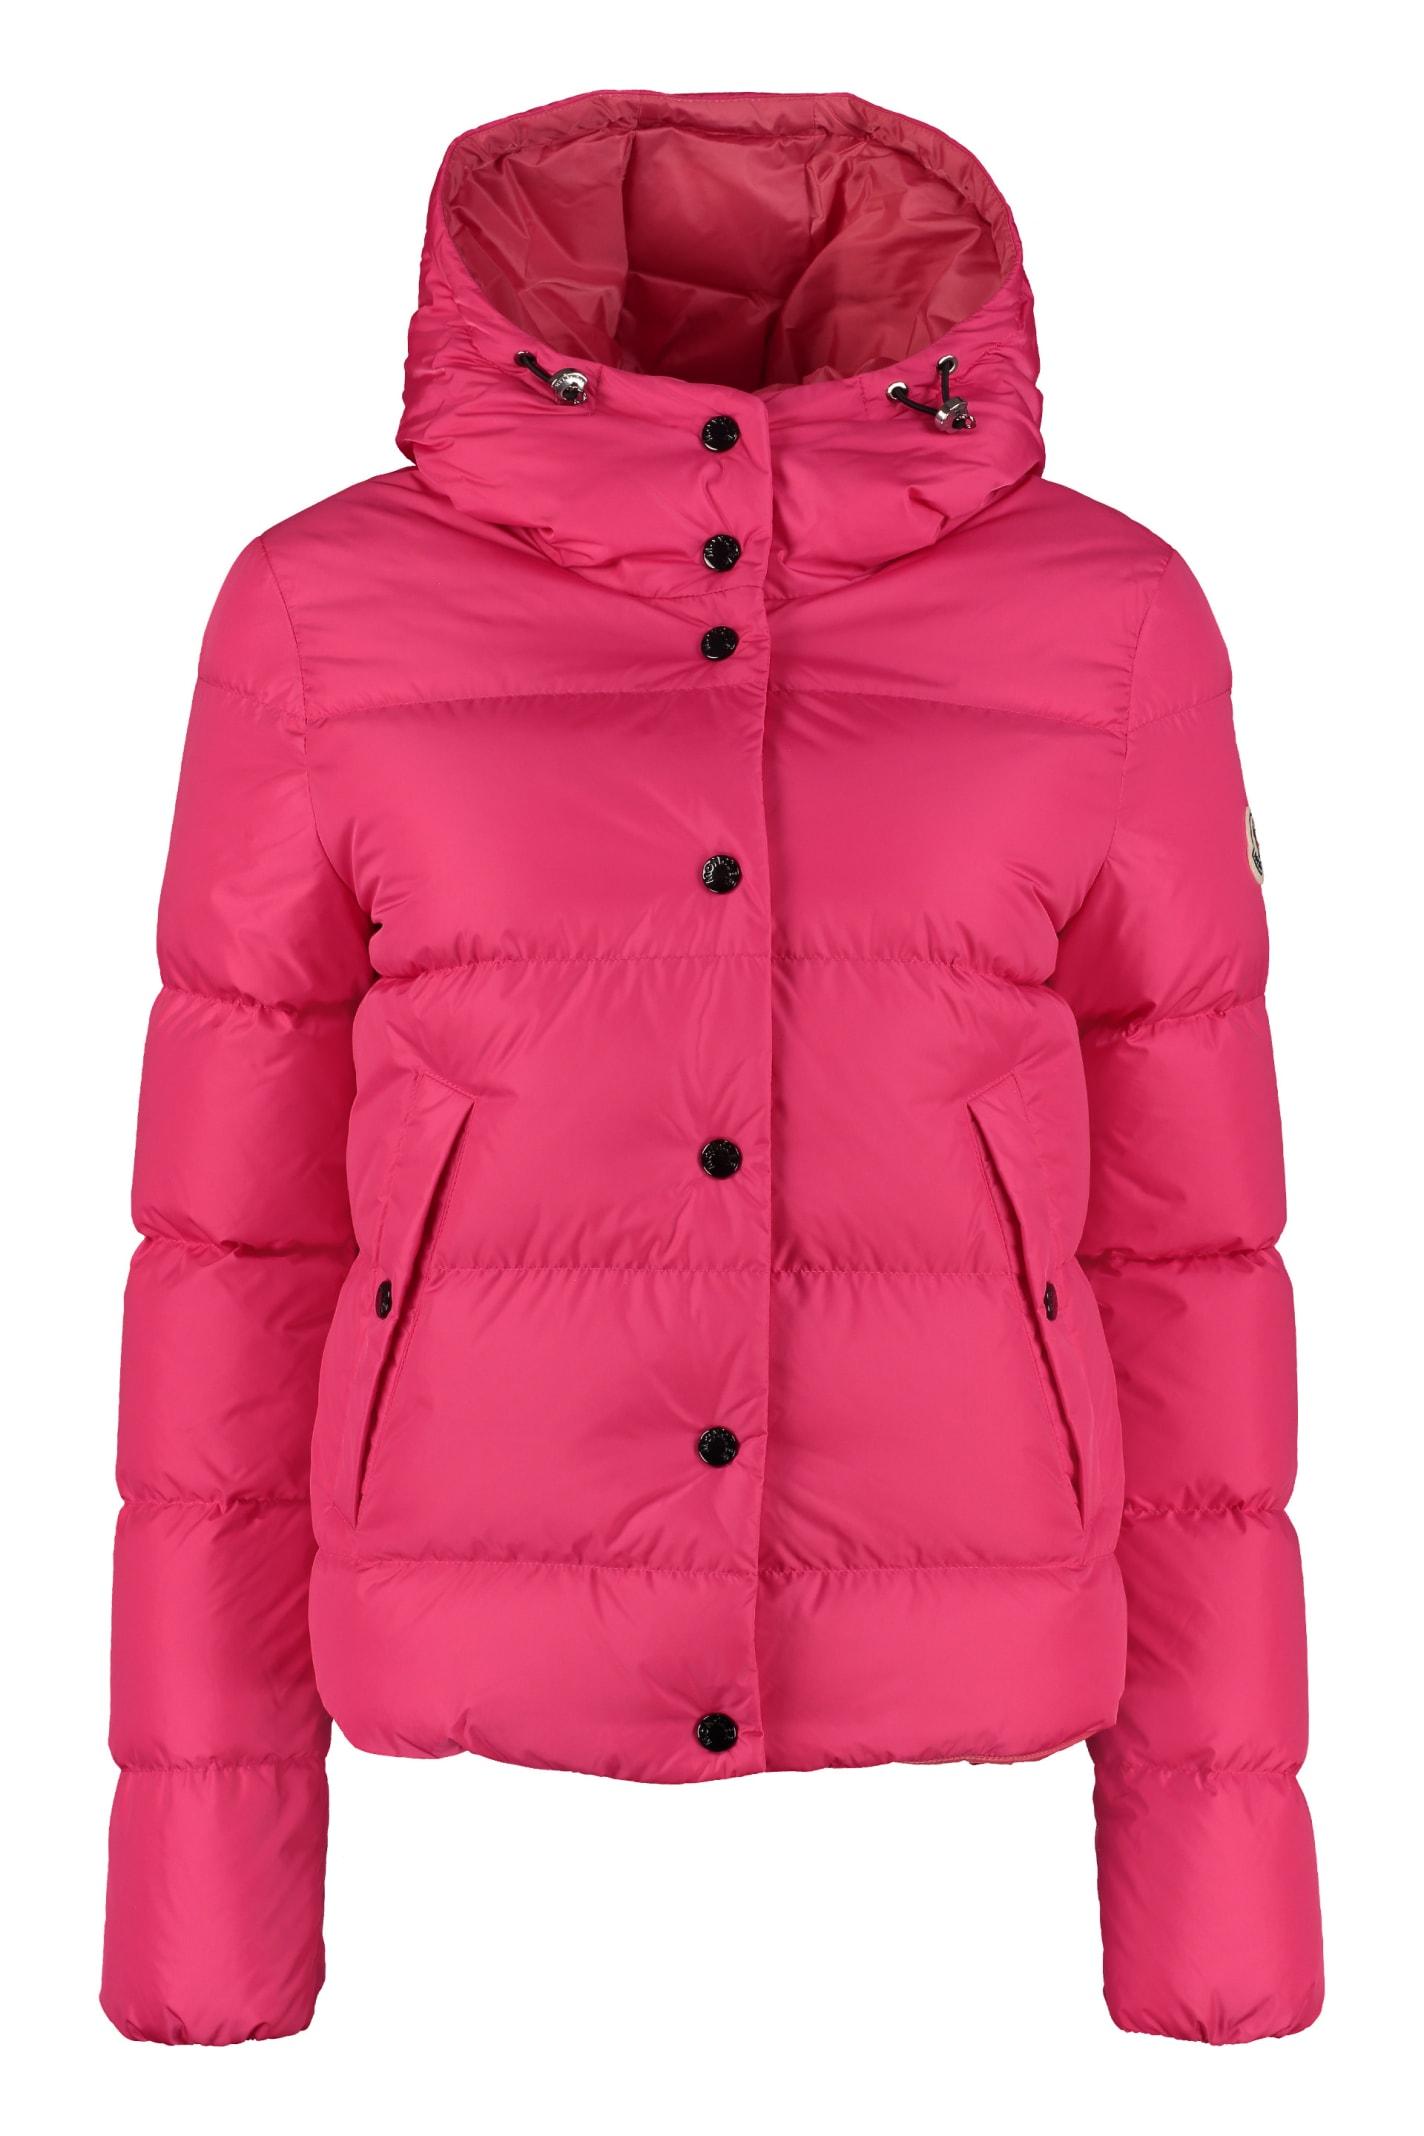 Moncler Lena Hooded Down Jacket